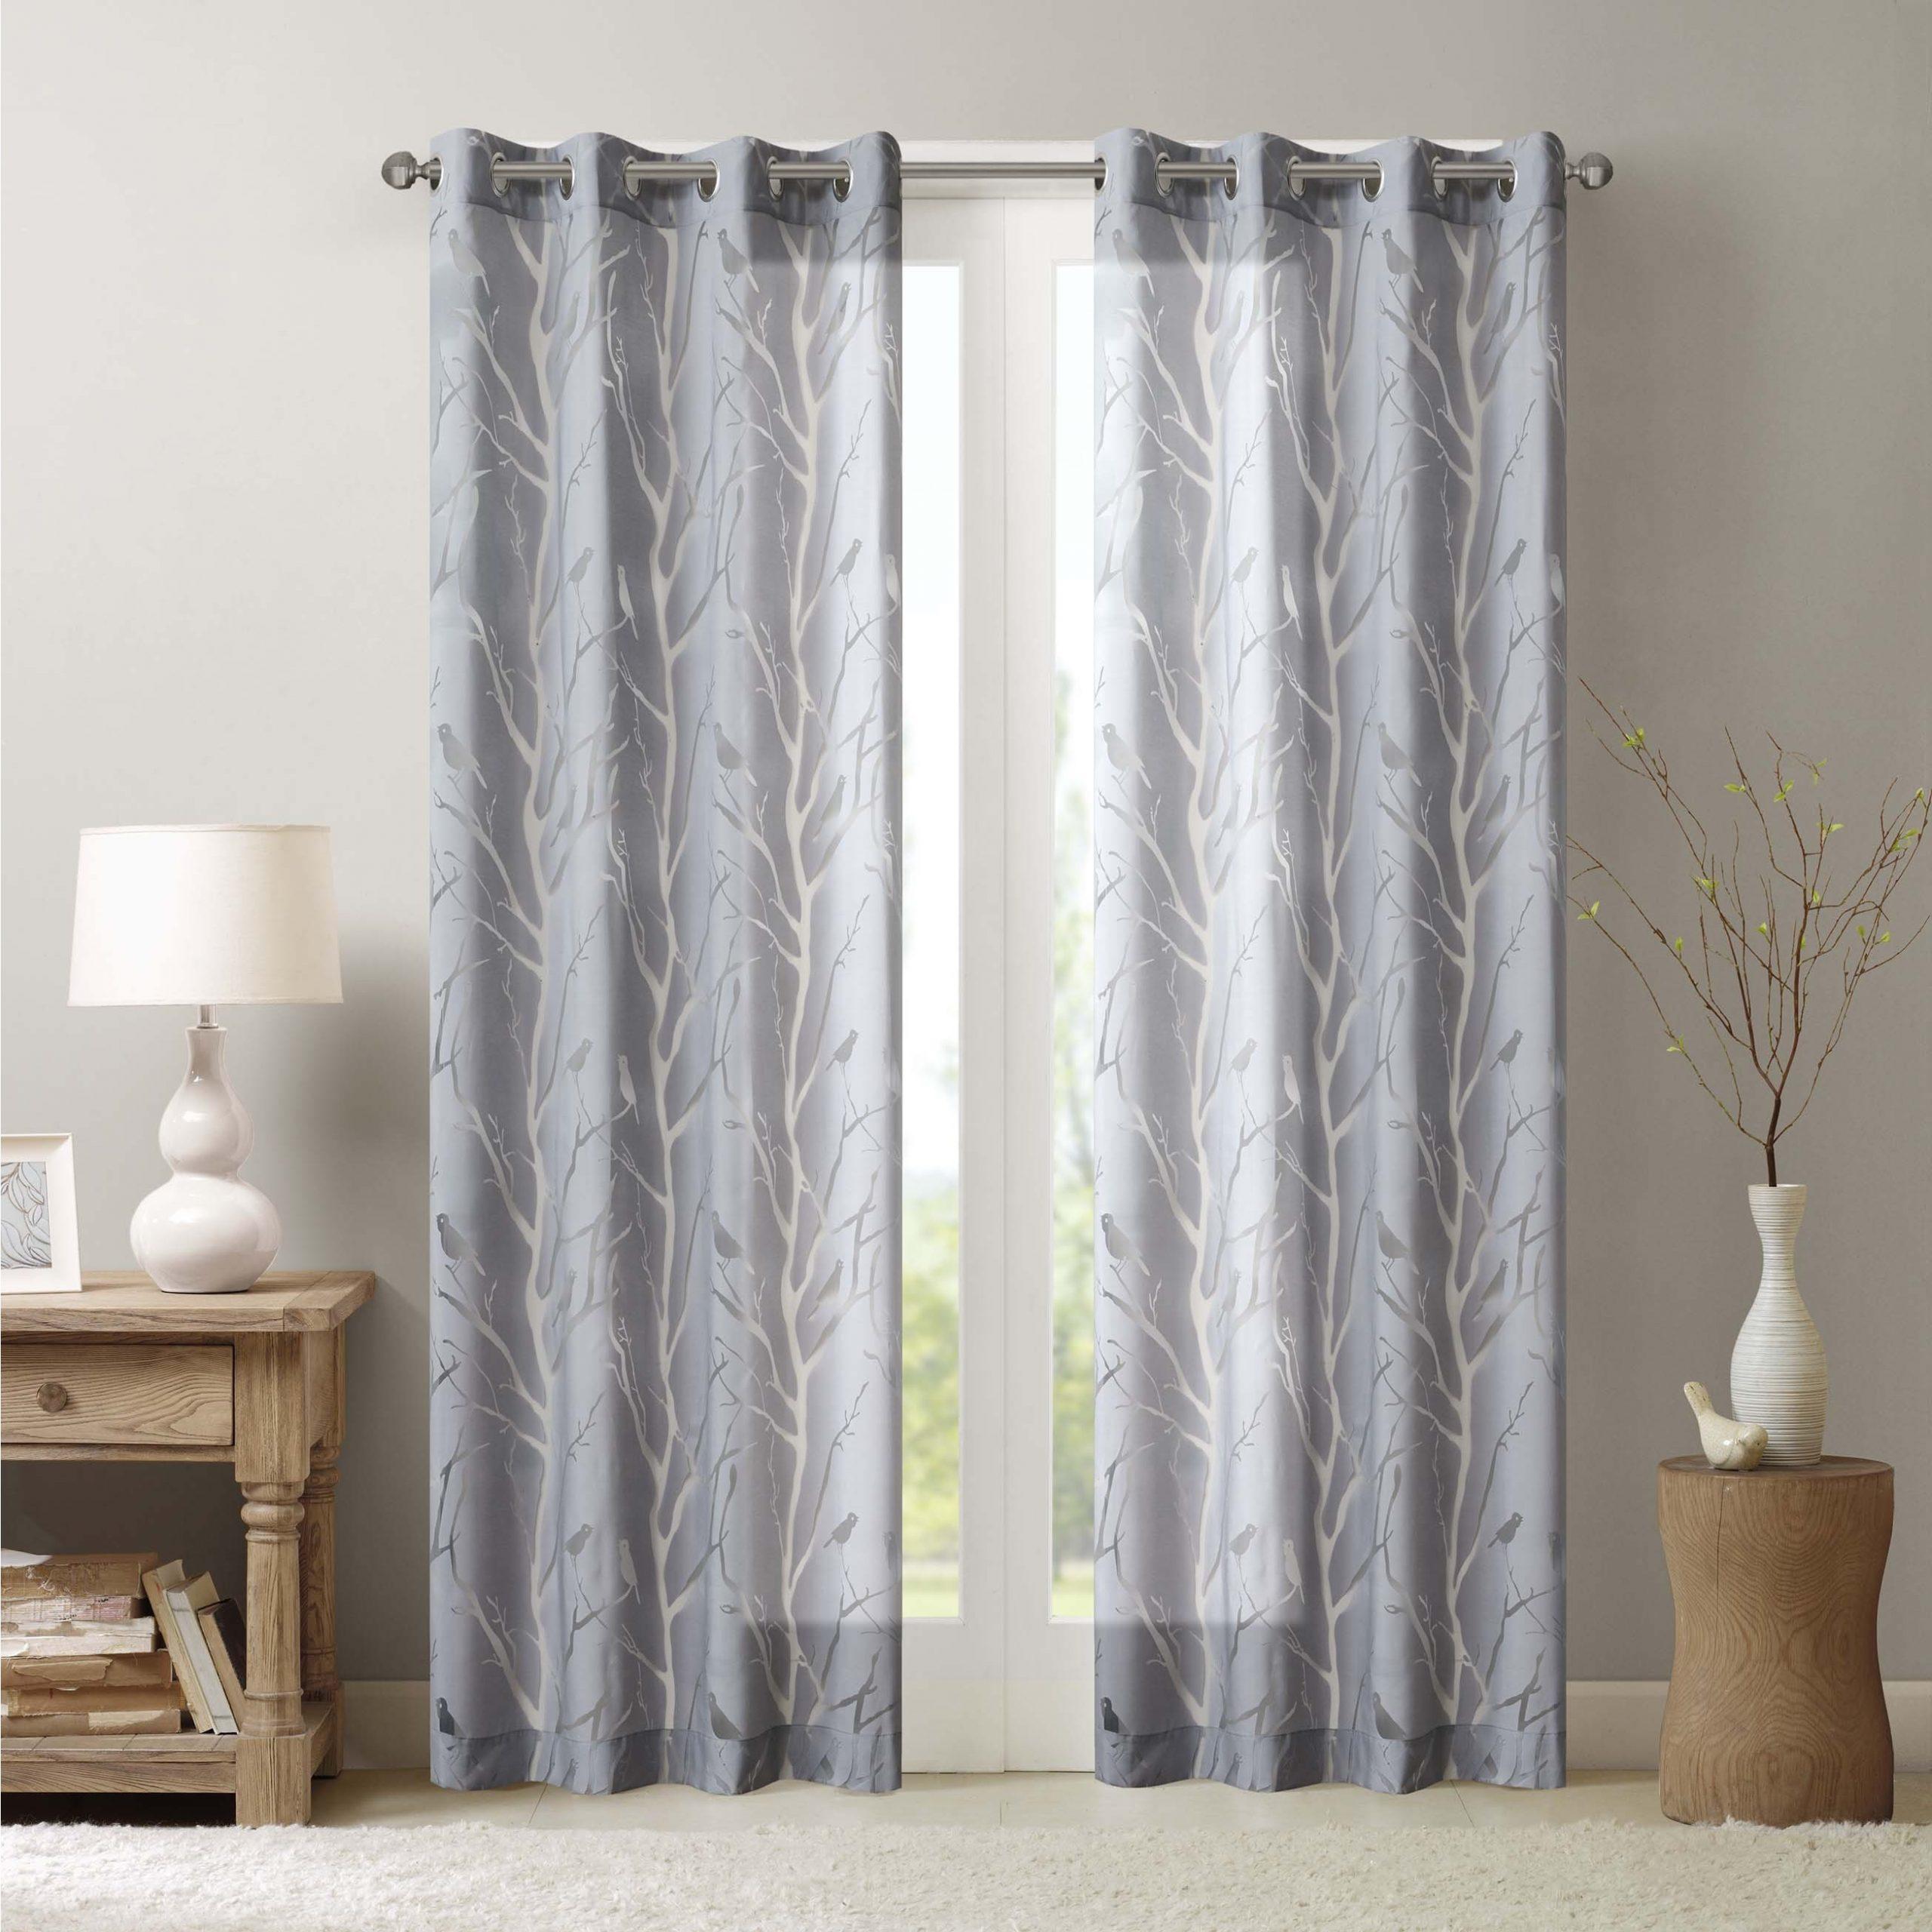 Newest Vina Sheer Bird Single Curtain Panels For Madison Park Vina Sheer Bird Single Curtain Panel (View 3 of 20)